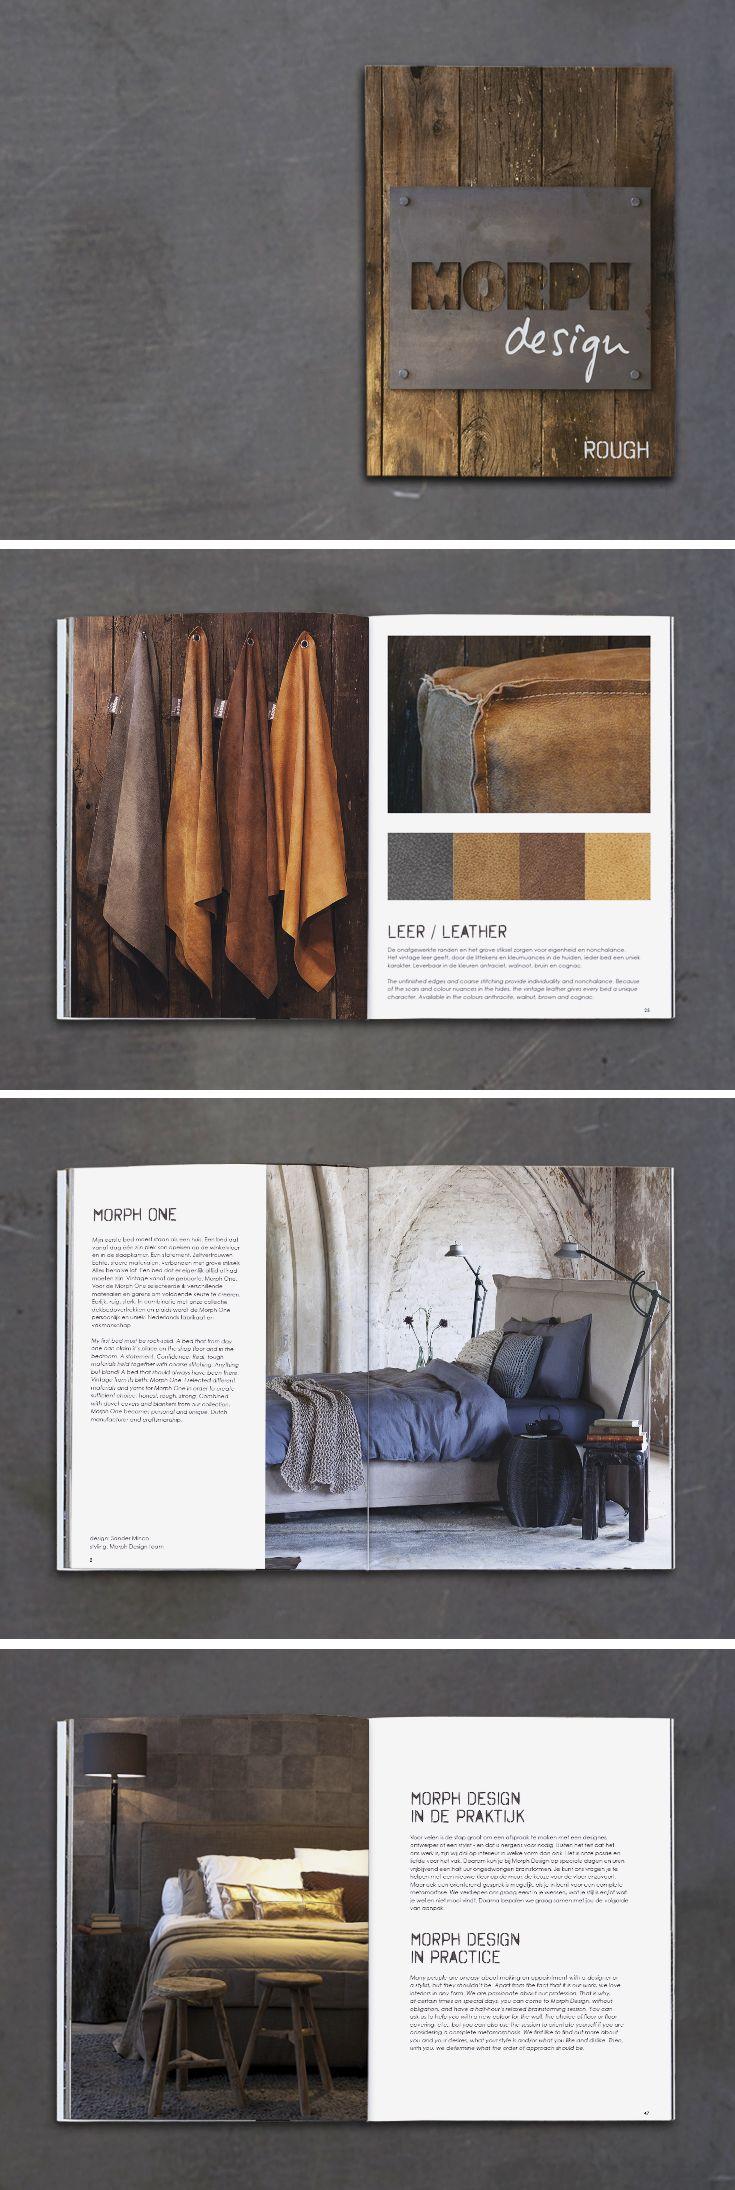 Morph Design Rough, ontwerp lay-out en vormgeving #magazine voor #MorphDesign @morphdesignnl